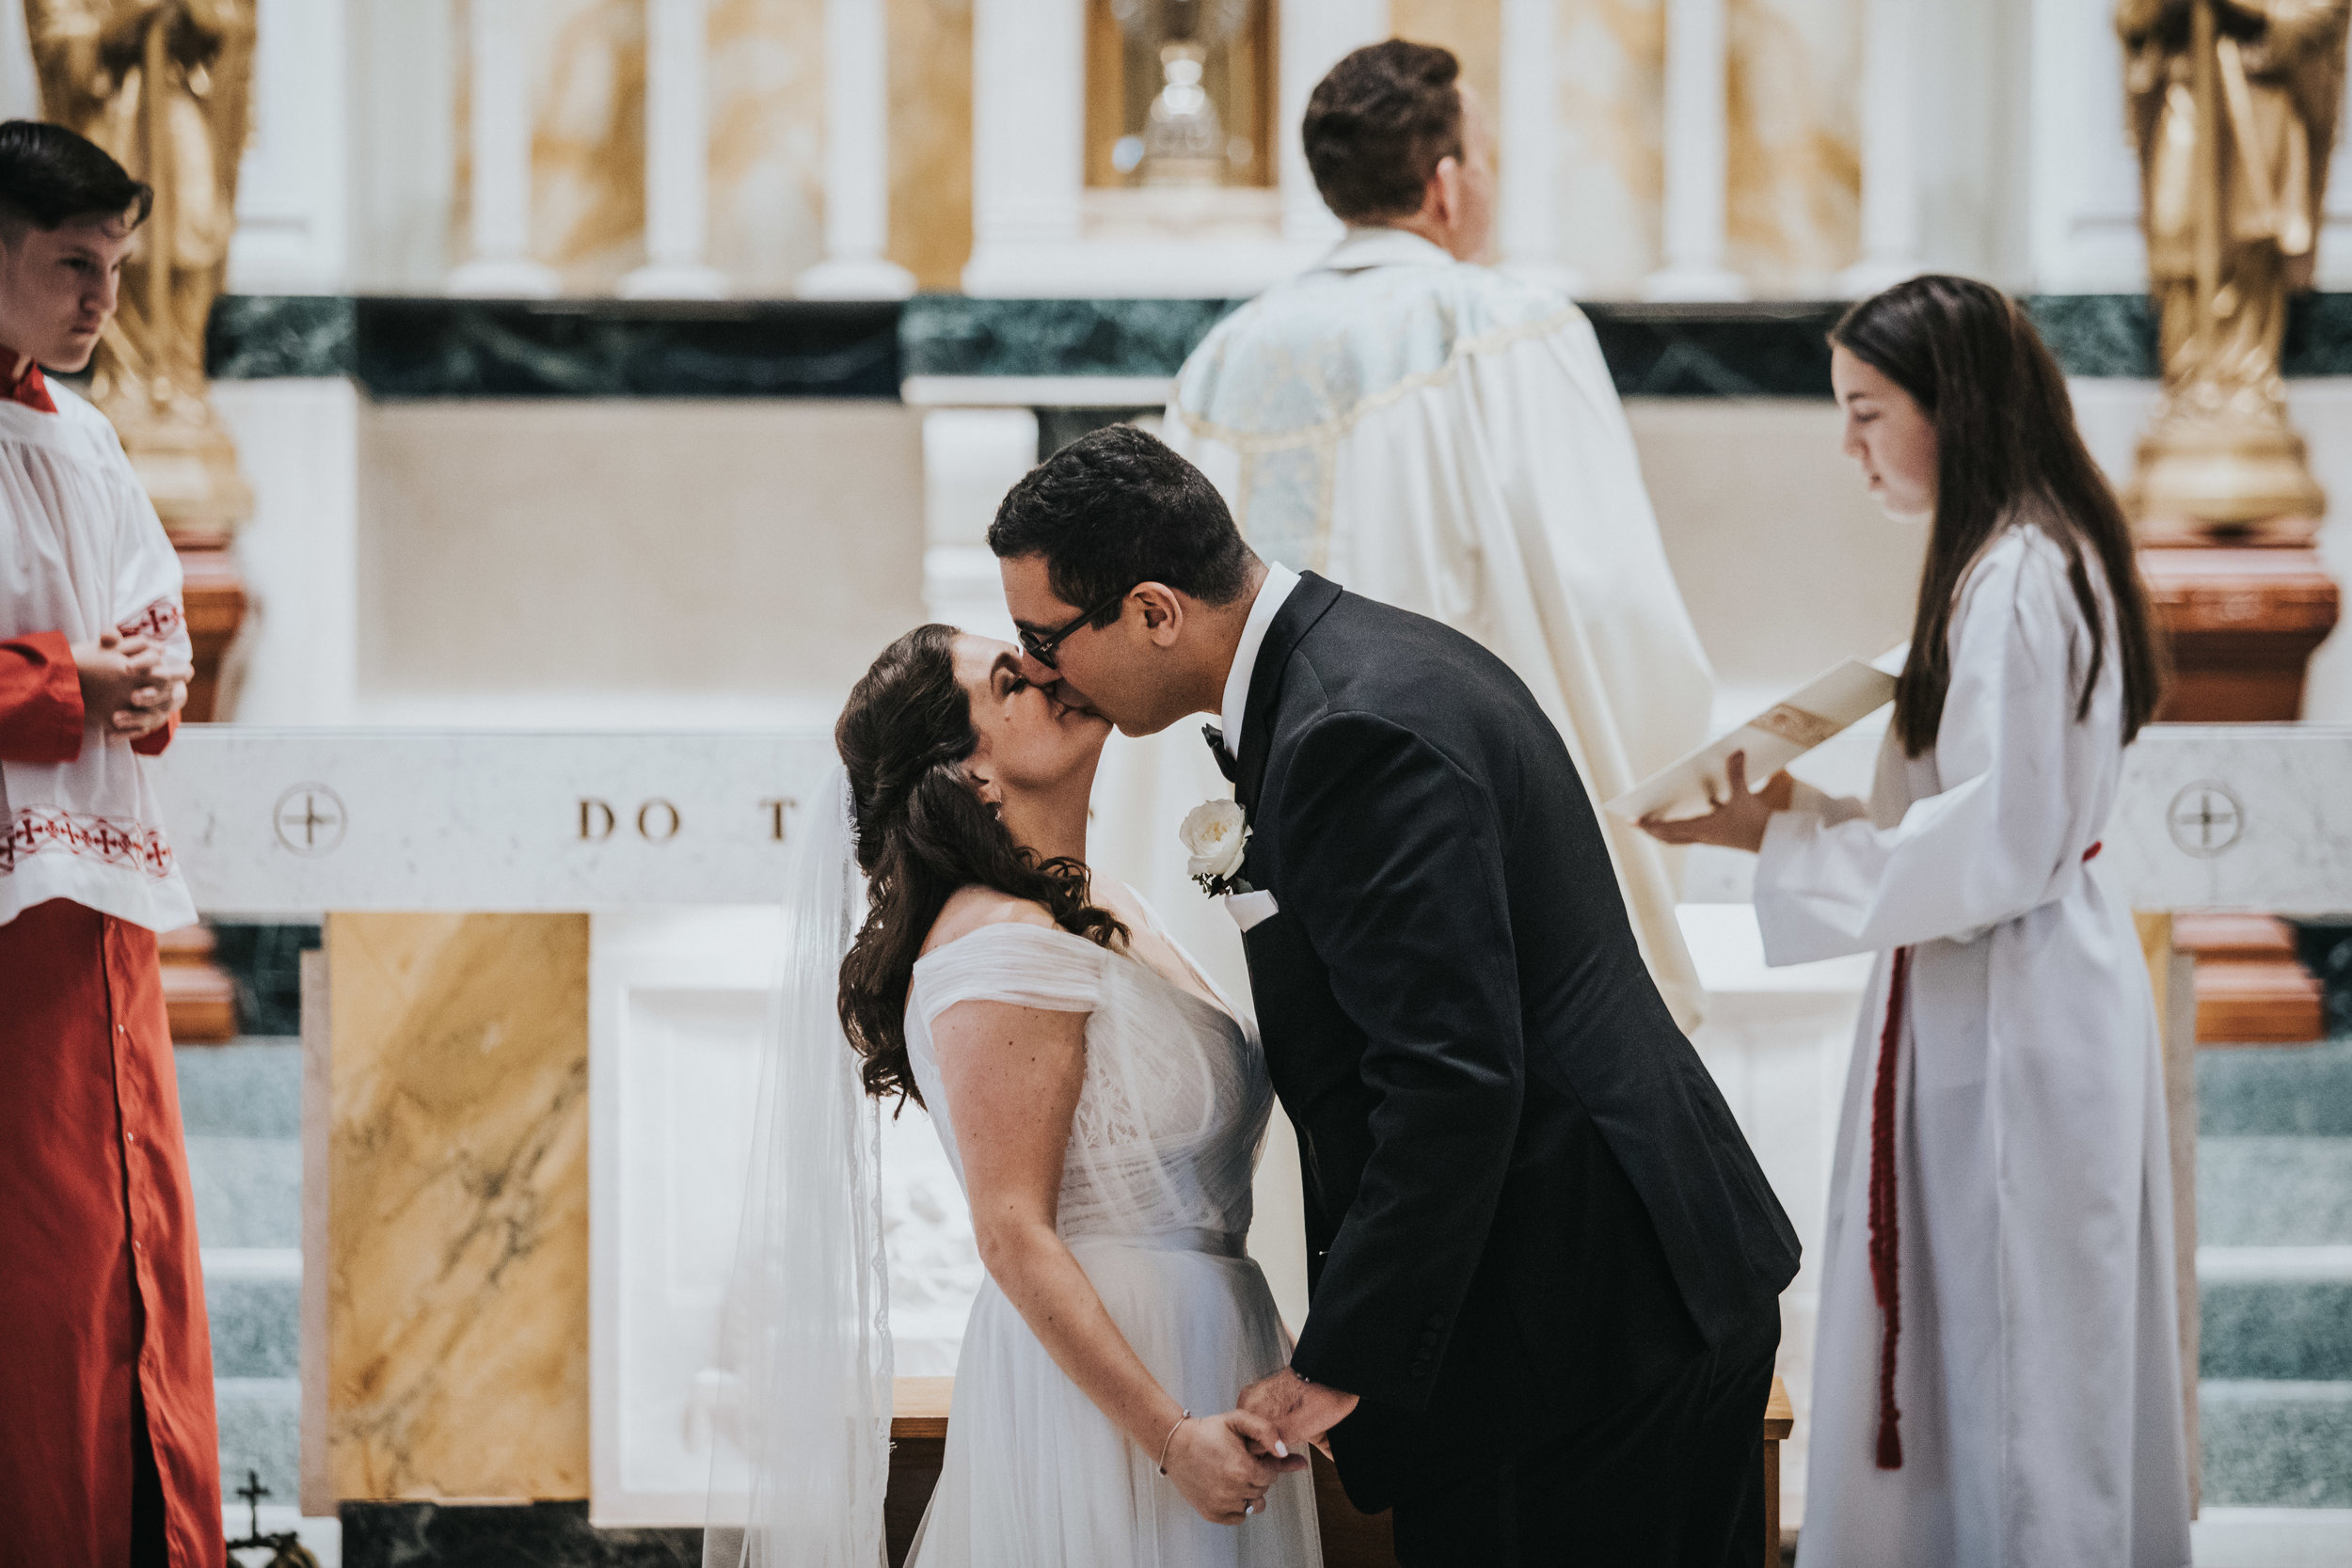 JennaLynnPhotography-NJWeddingPhotographer-Philadelphia-Wedding-ArtsBallroom-Ceremony-58.jpg